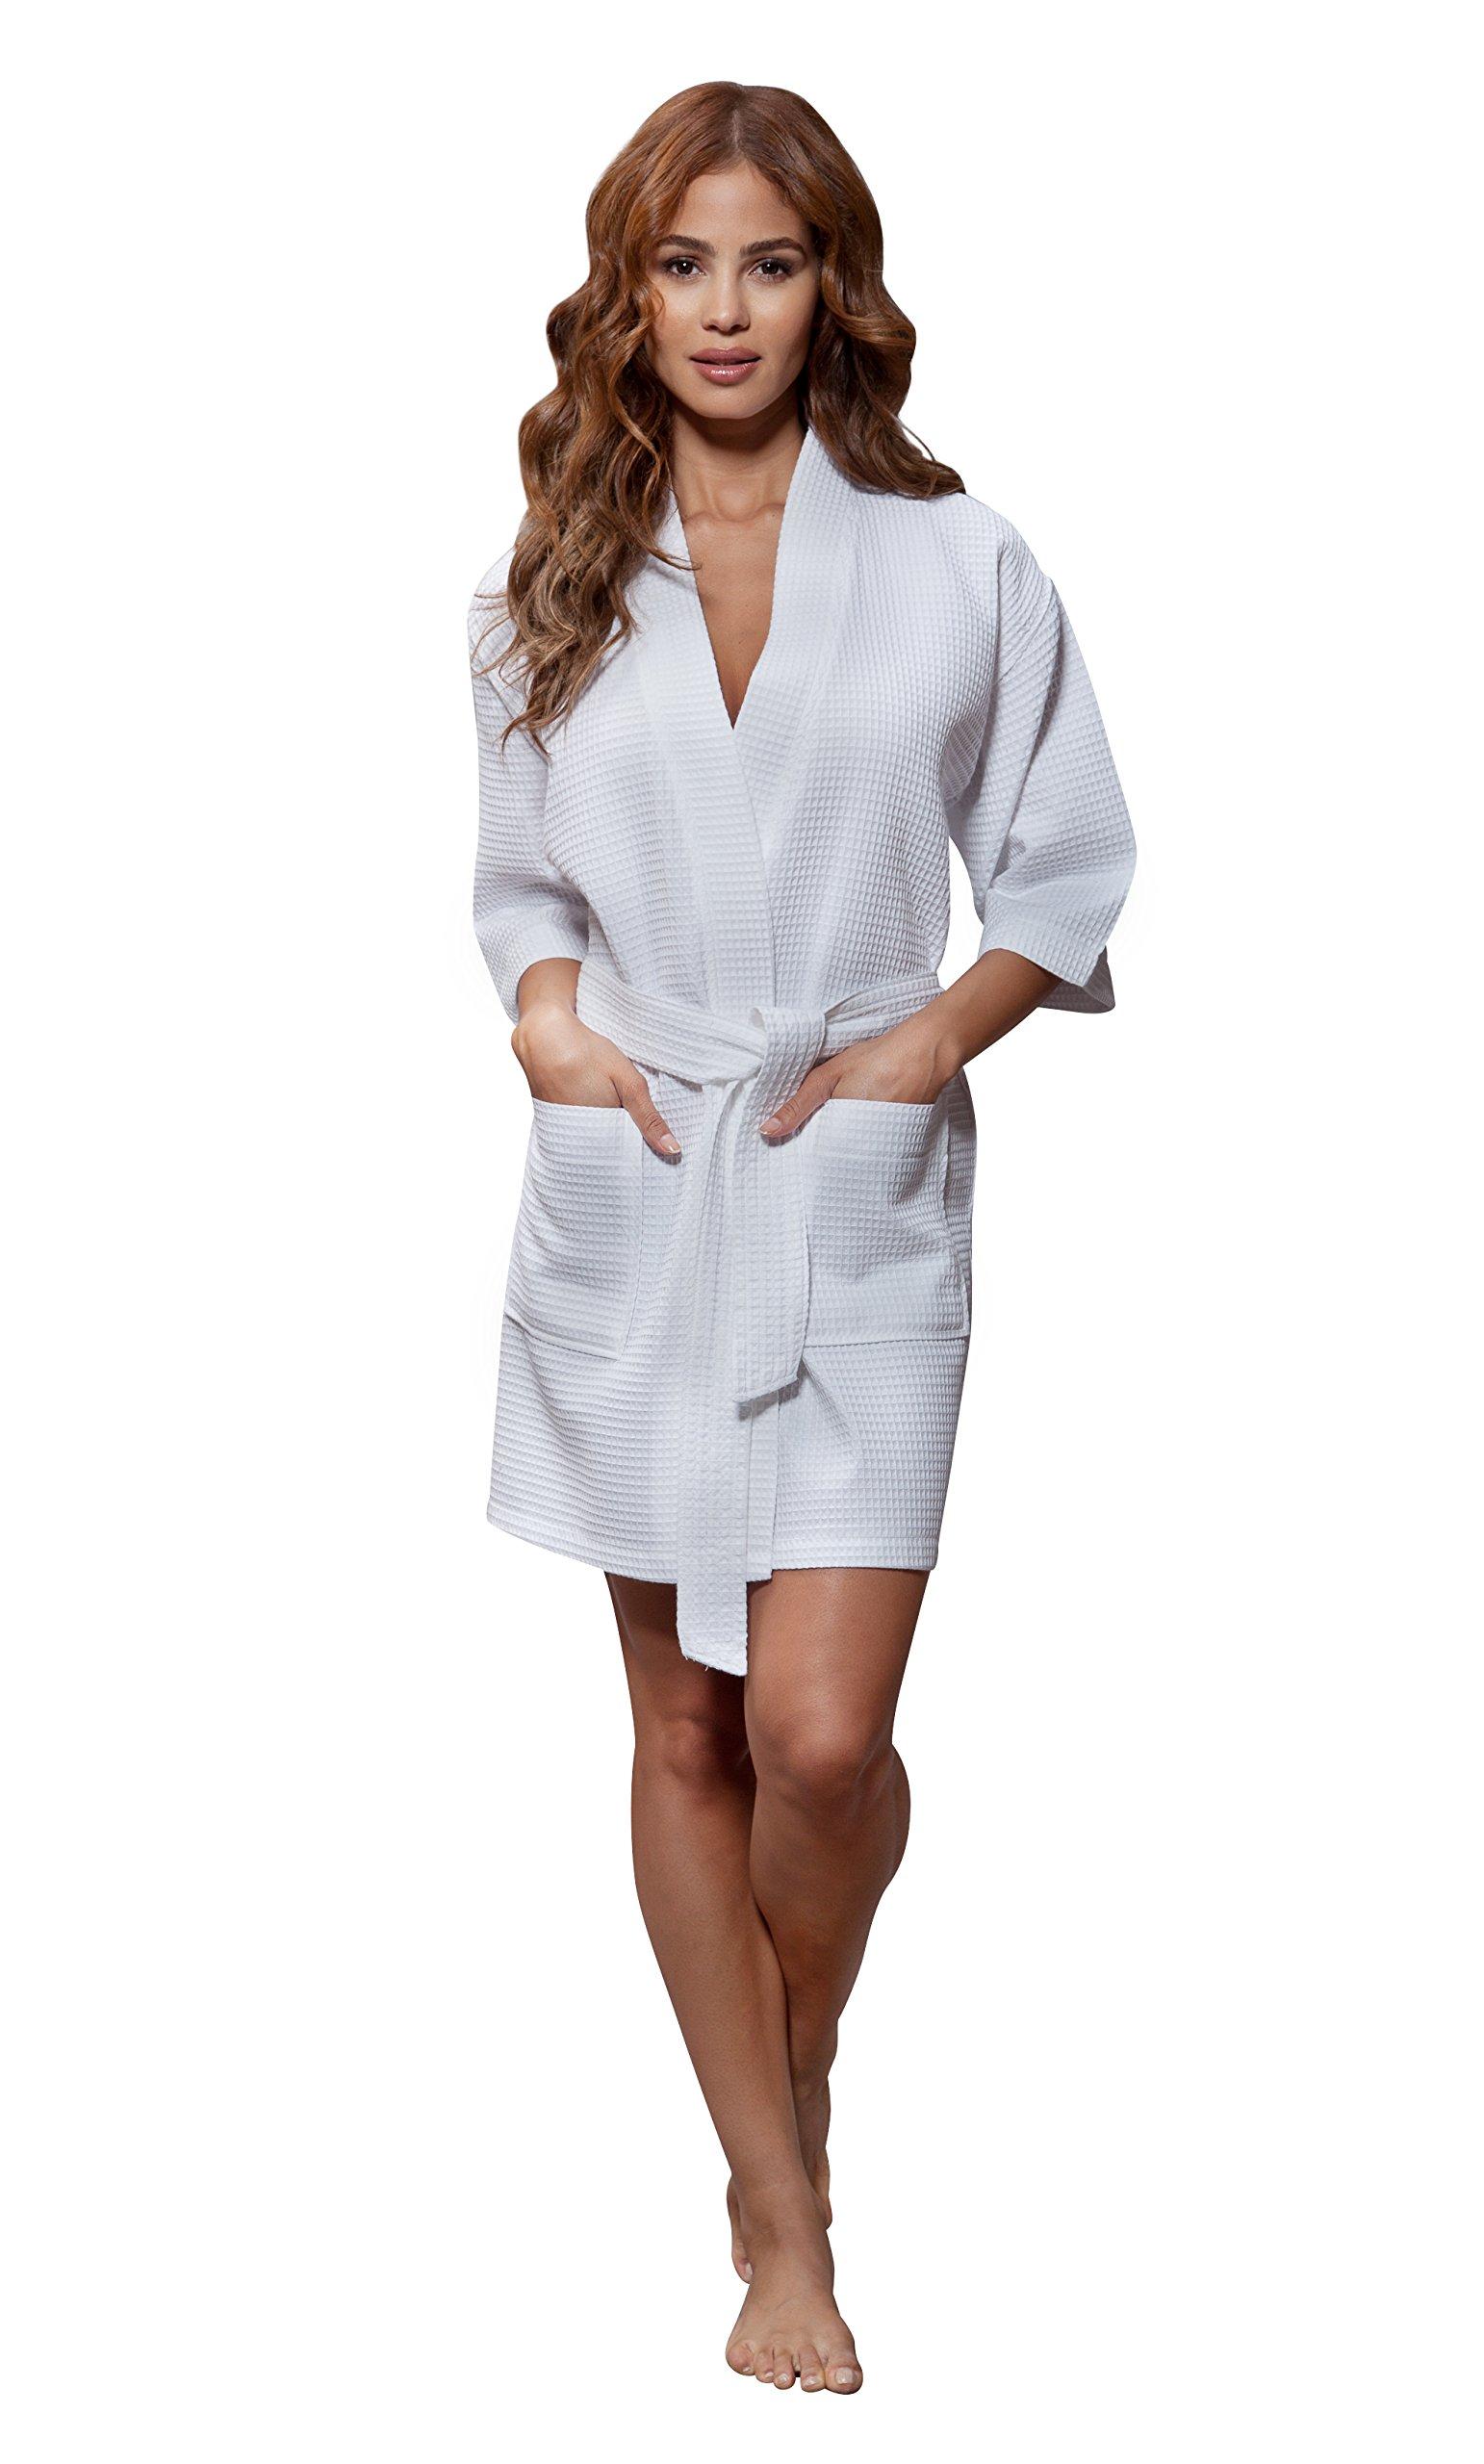 Turquaz Linen Lightweight Knee Length Waffle Kimono Bridesmaids Spa Robe (Small/Medium, White)